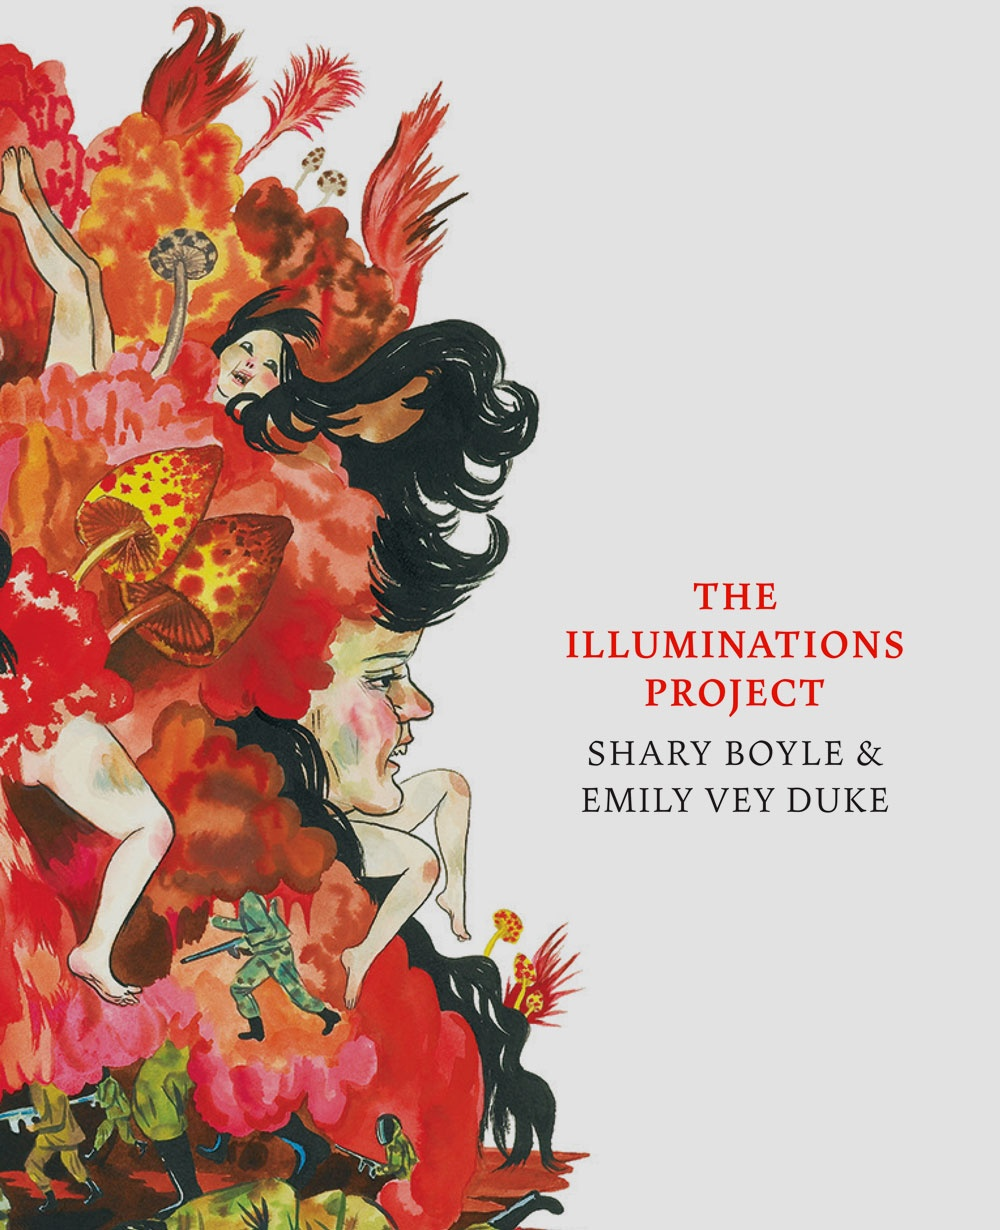 The Illuminations Project